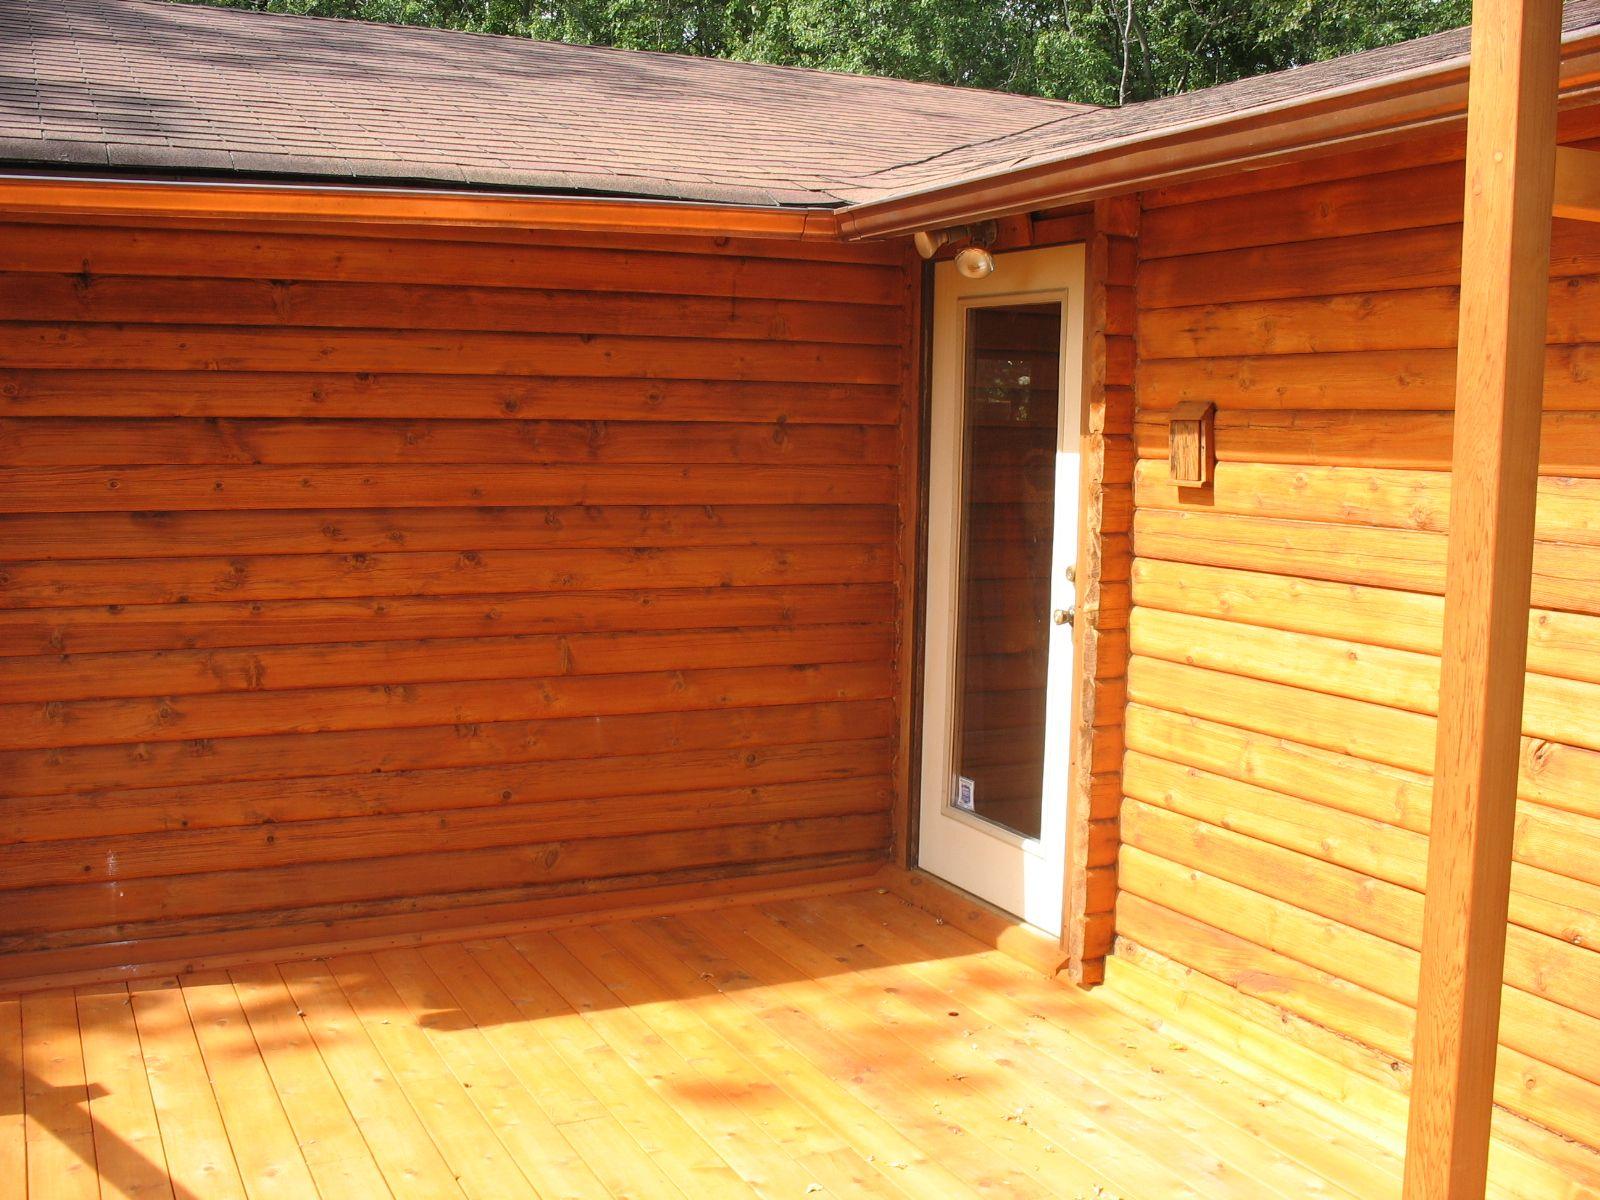 Large Log Cabin Restored With Deck Restoration Plus Medford Cedar Stain And Sealer Large Log Cabins Deck Restoration House In The Woods